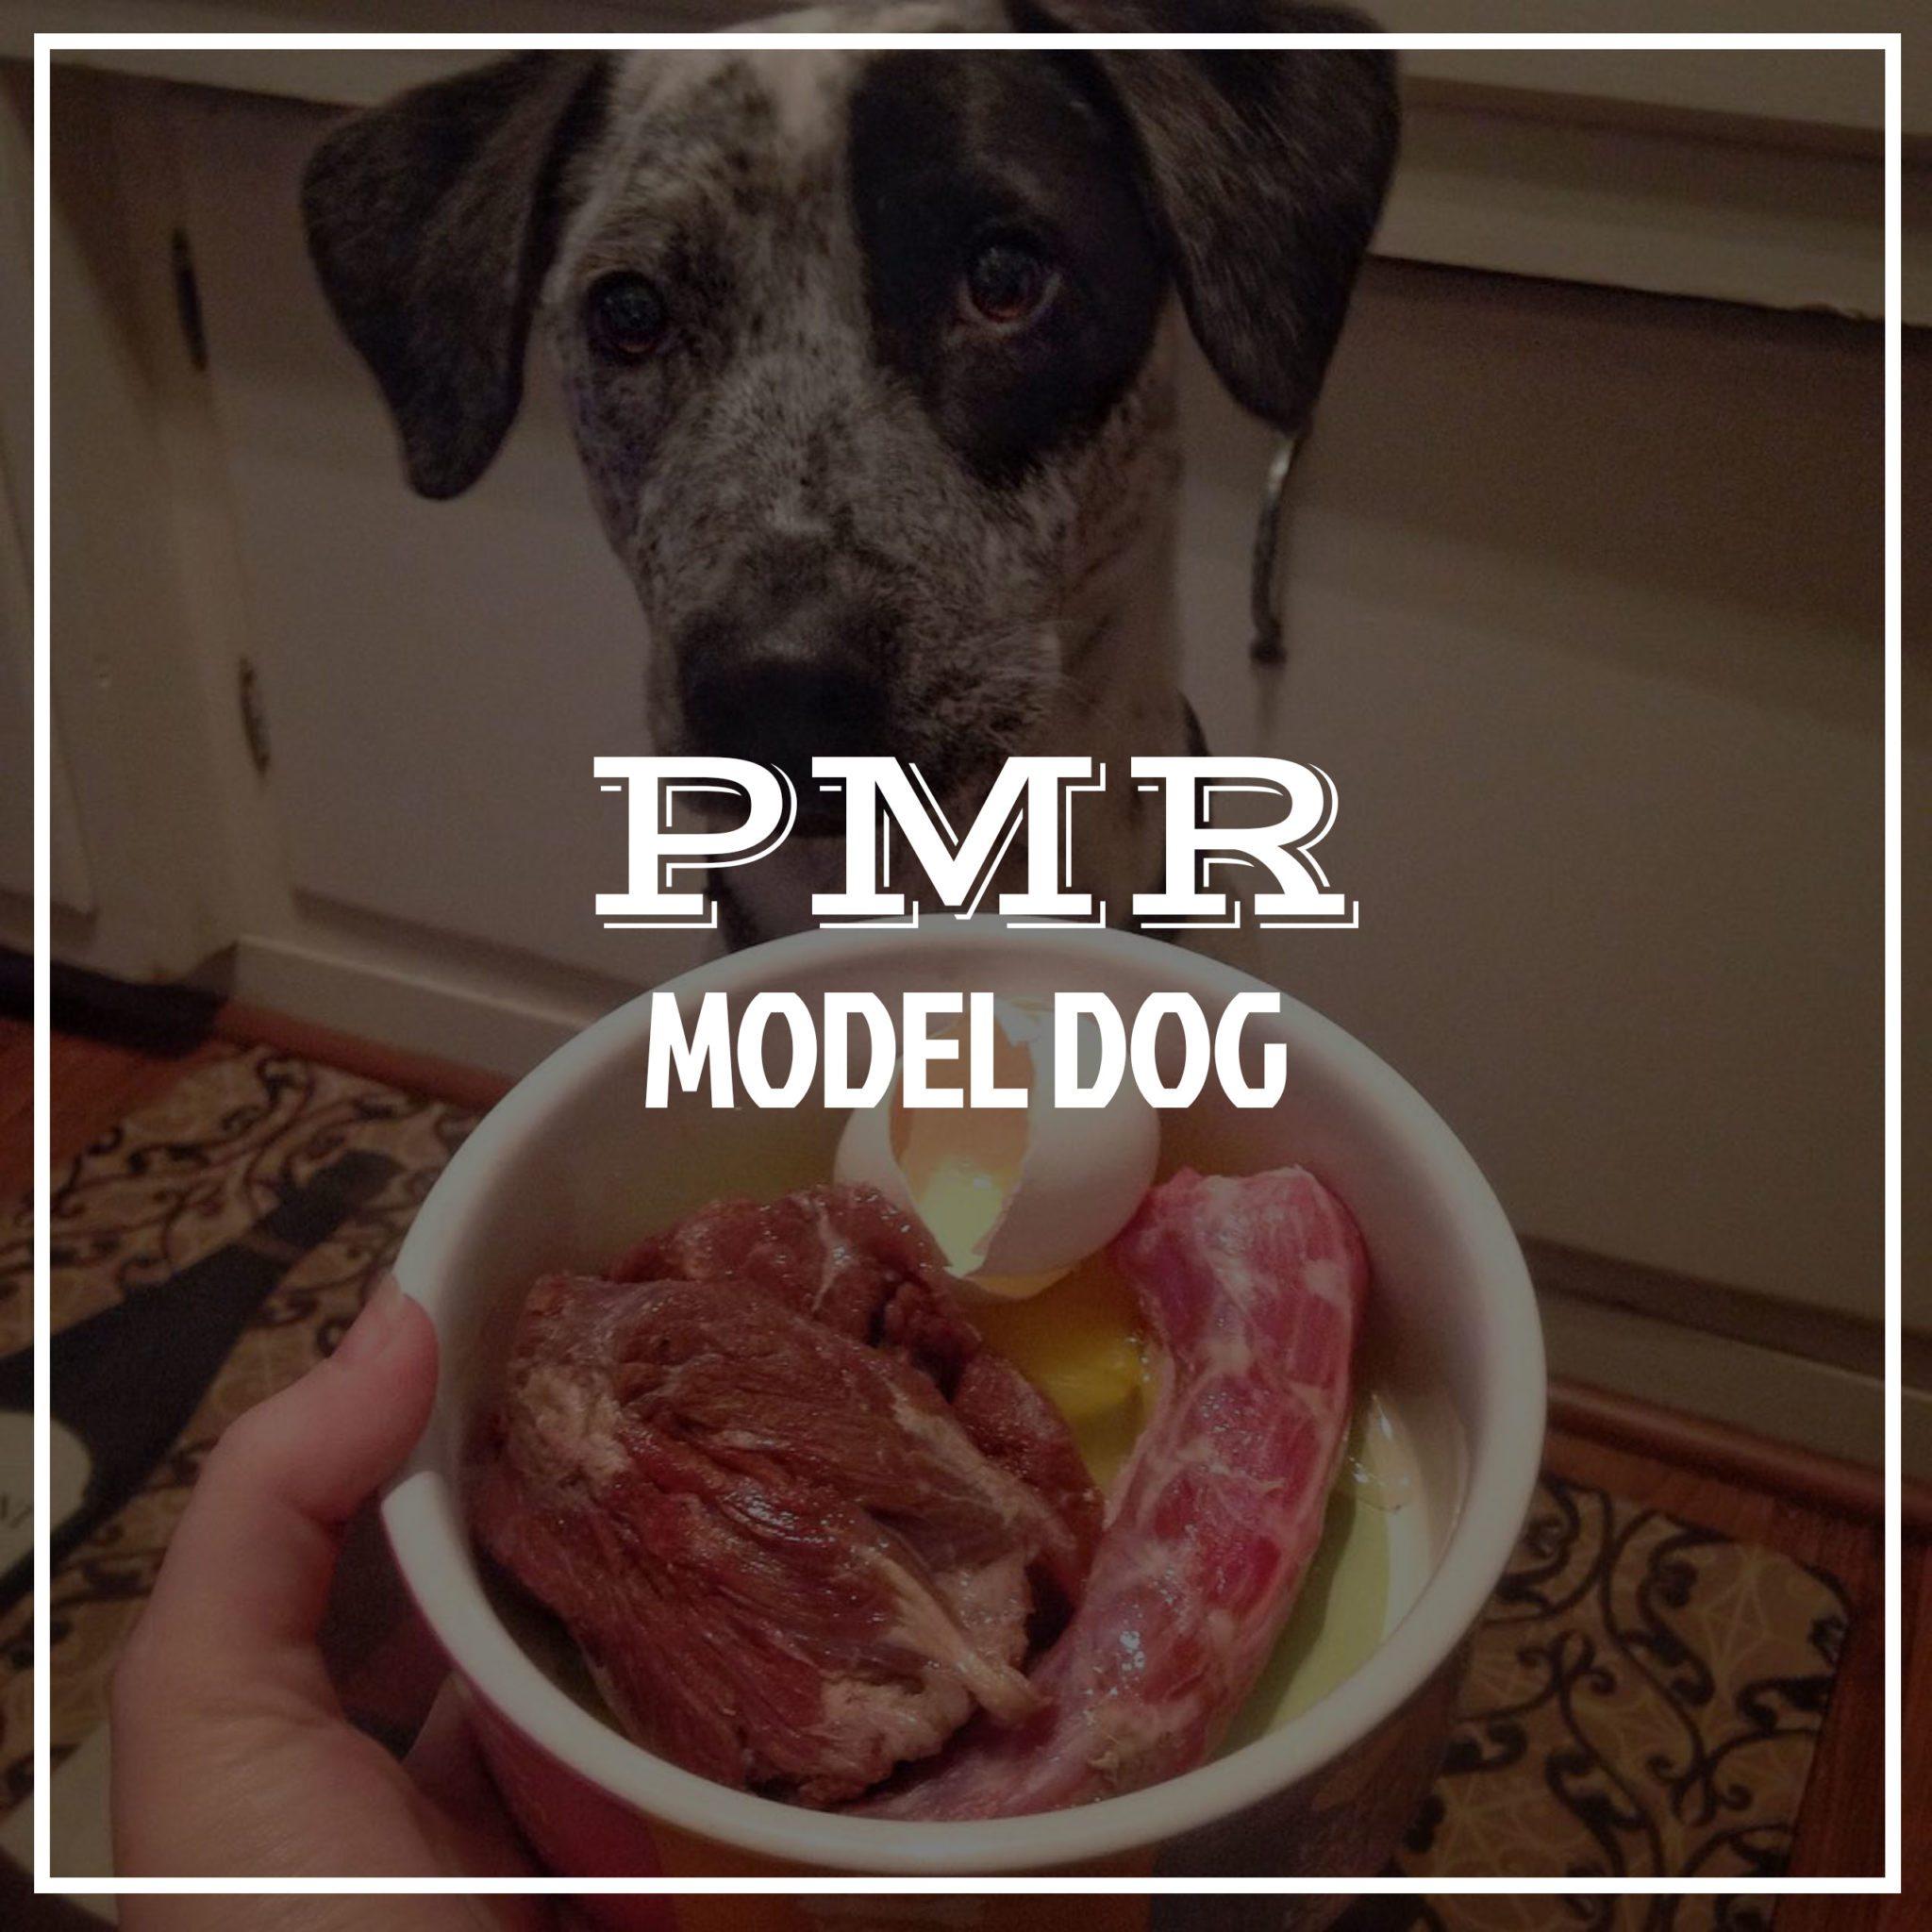 pmrdogmodel